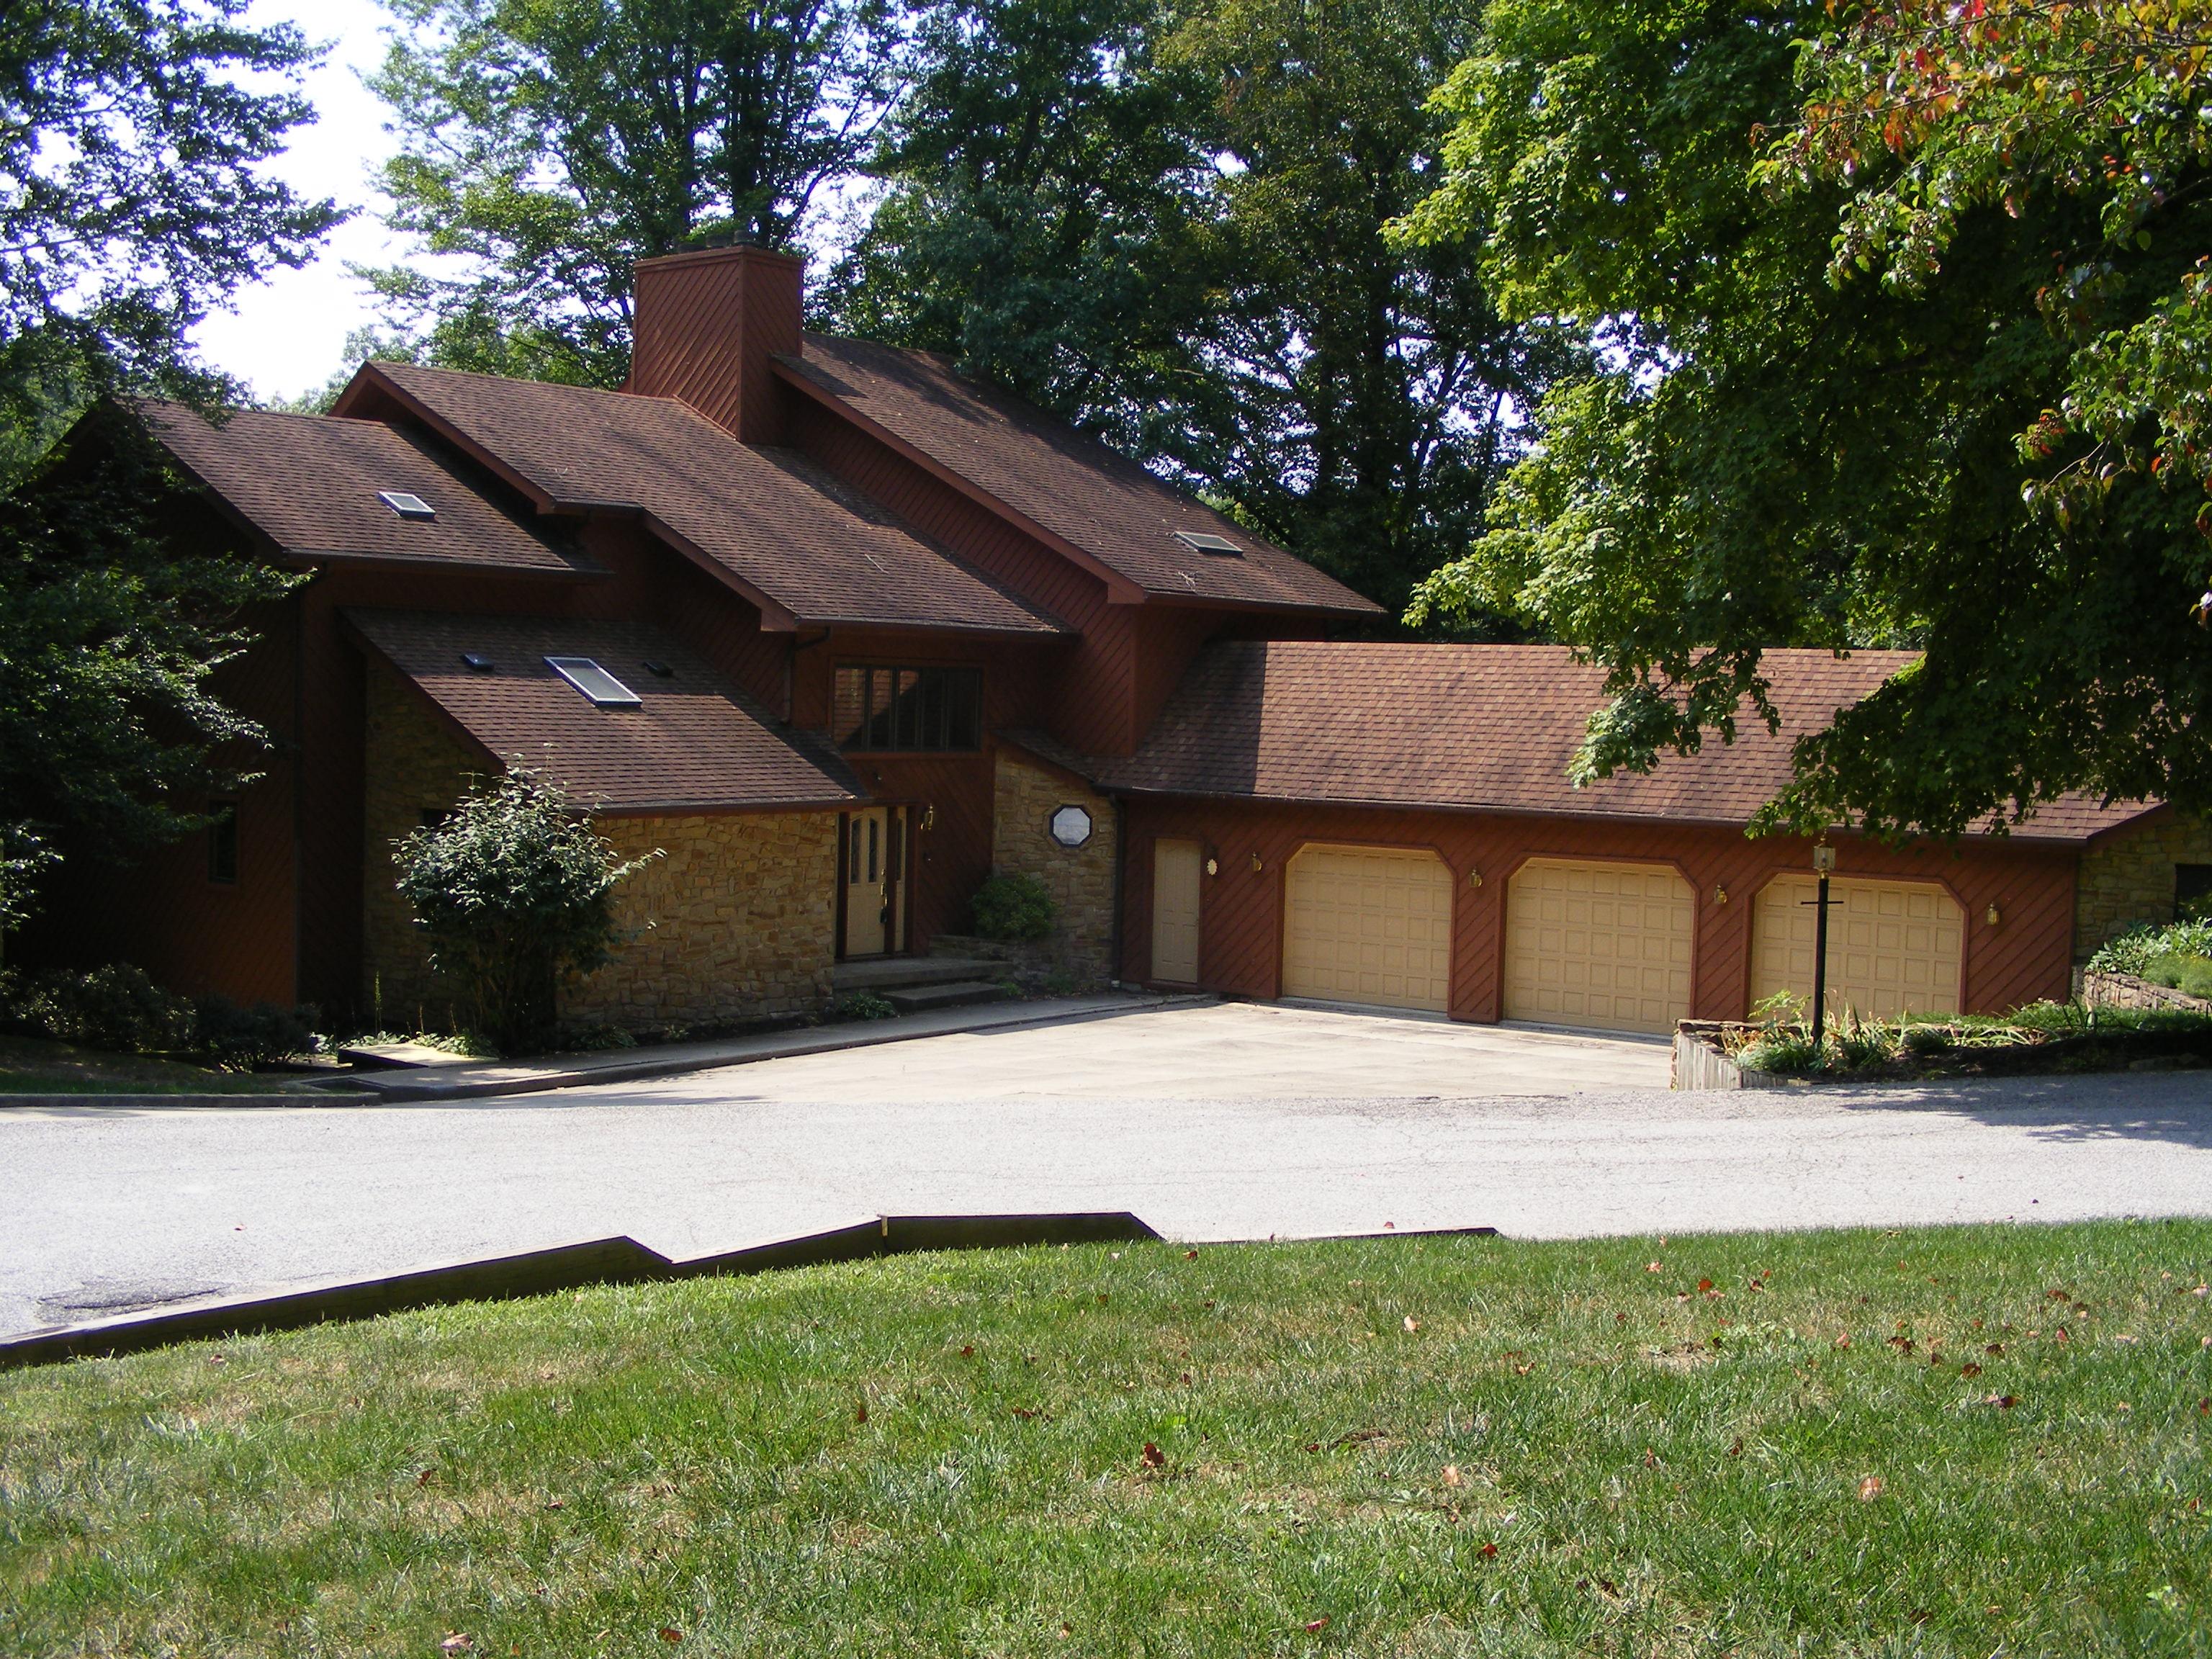 8236 N Maplewood Pl, Terre Haute (west), Indiana 47885